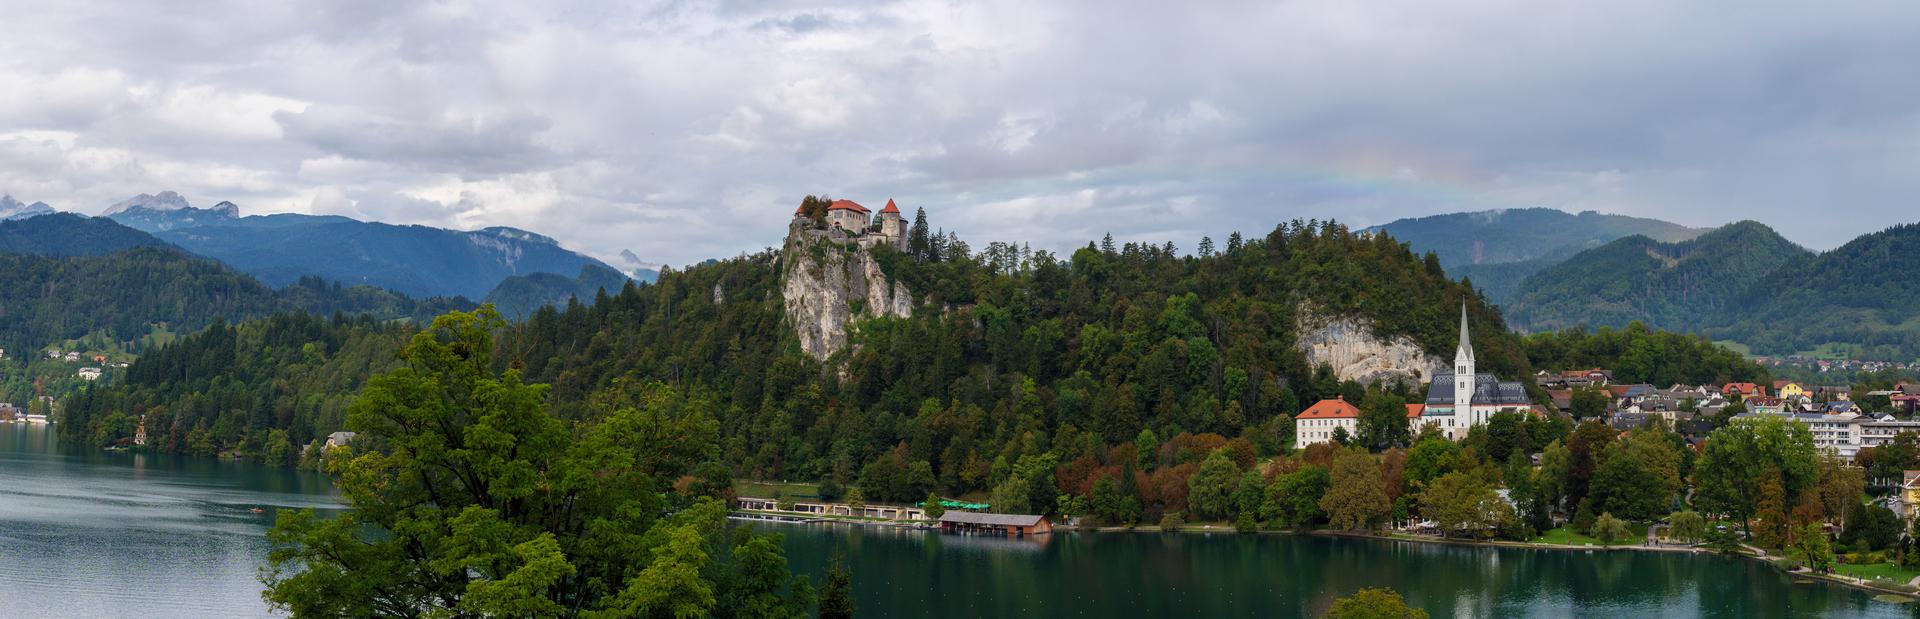 La vista su Bled dall'Hotel Rikli Balance.